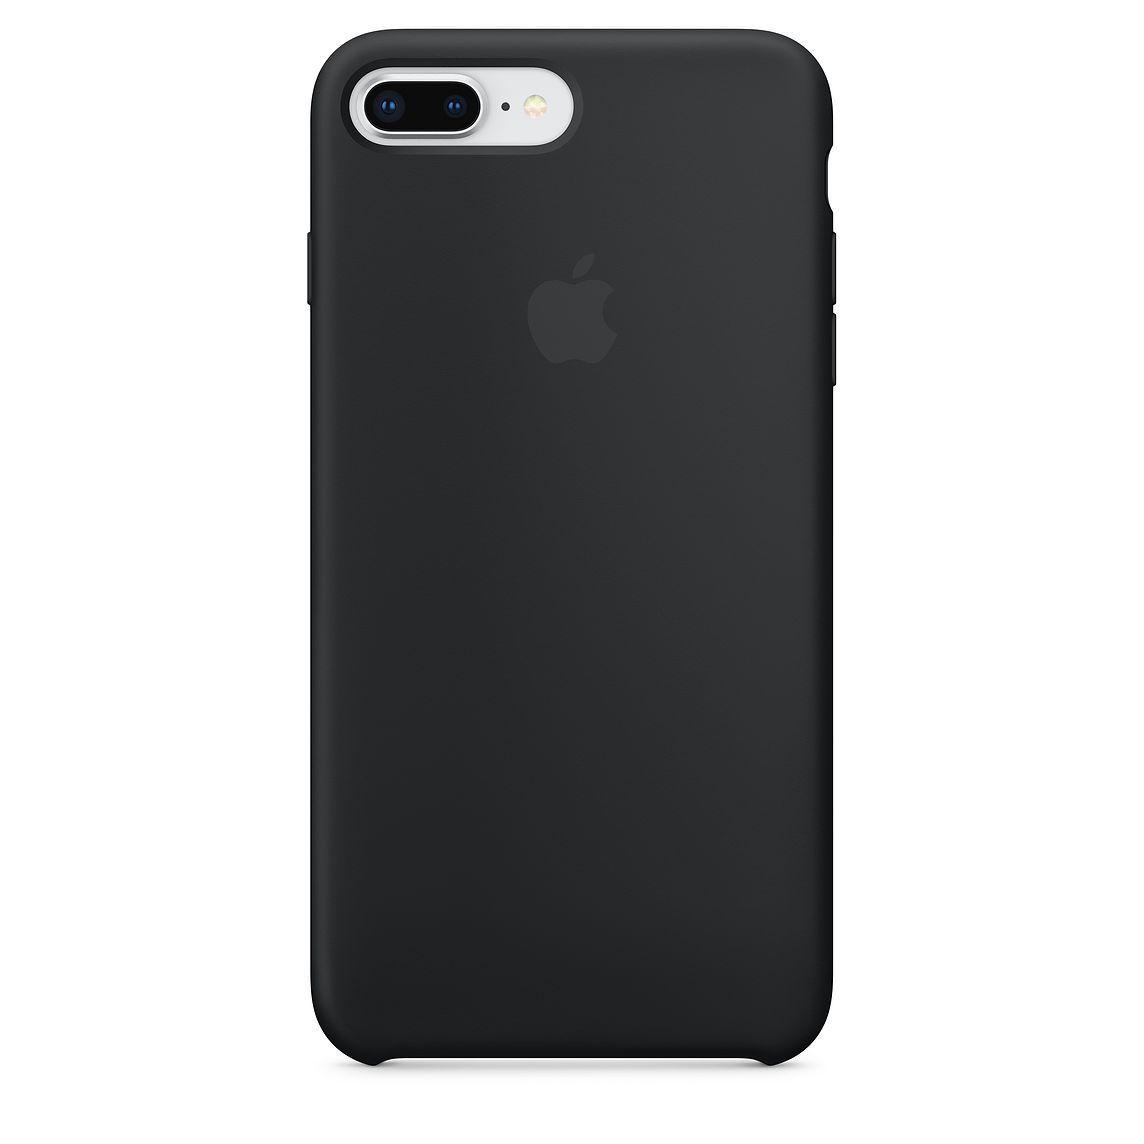 Iphone 8 Plus 7 Plus Silicone Case Pink Sand Apple Fundas De Silicona Para Iphone Fundas Para Iphone 5s Carcasa Iphone